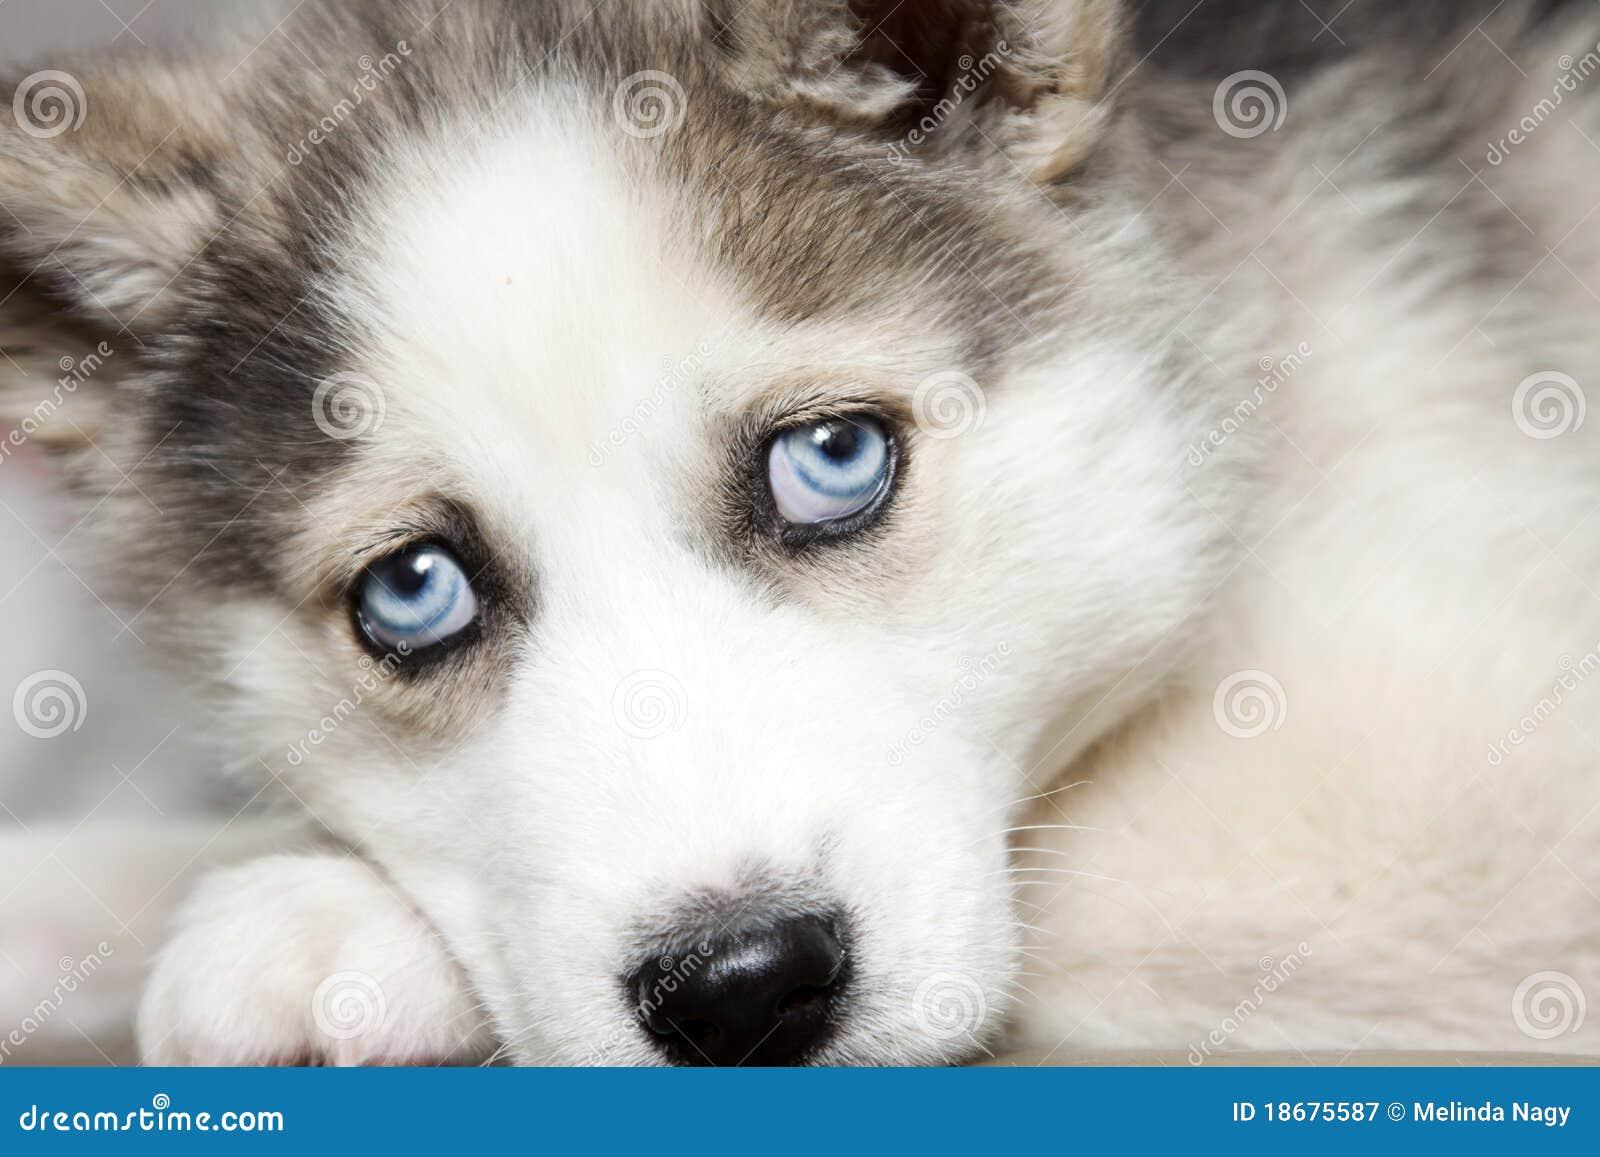 Blue Eyes Of Cute Siberian Husky Puppy Stock Image - Image